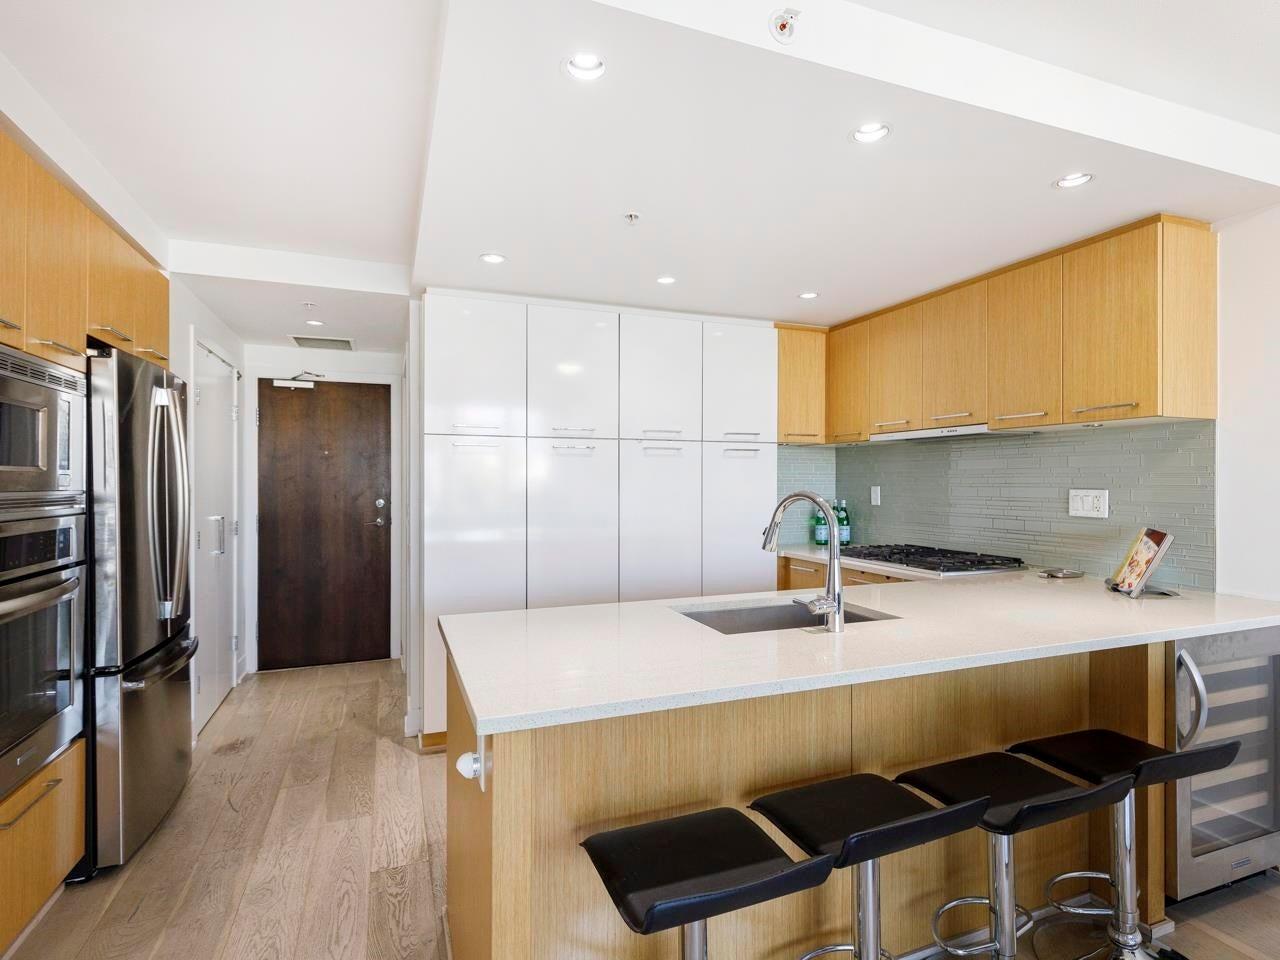 310 1680 W 4TH AVENUE - False Creek Apartment/Condo for sale, 2 Bedrooms (R2601348) - #1